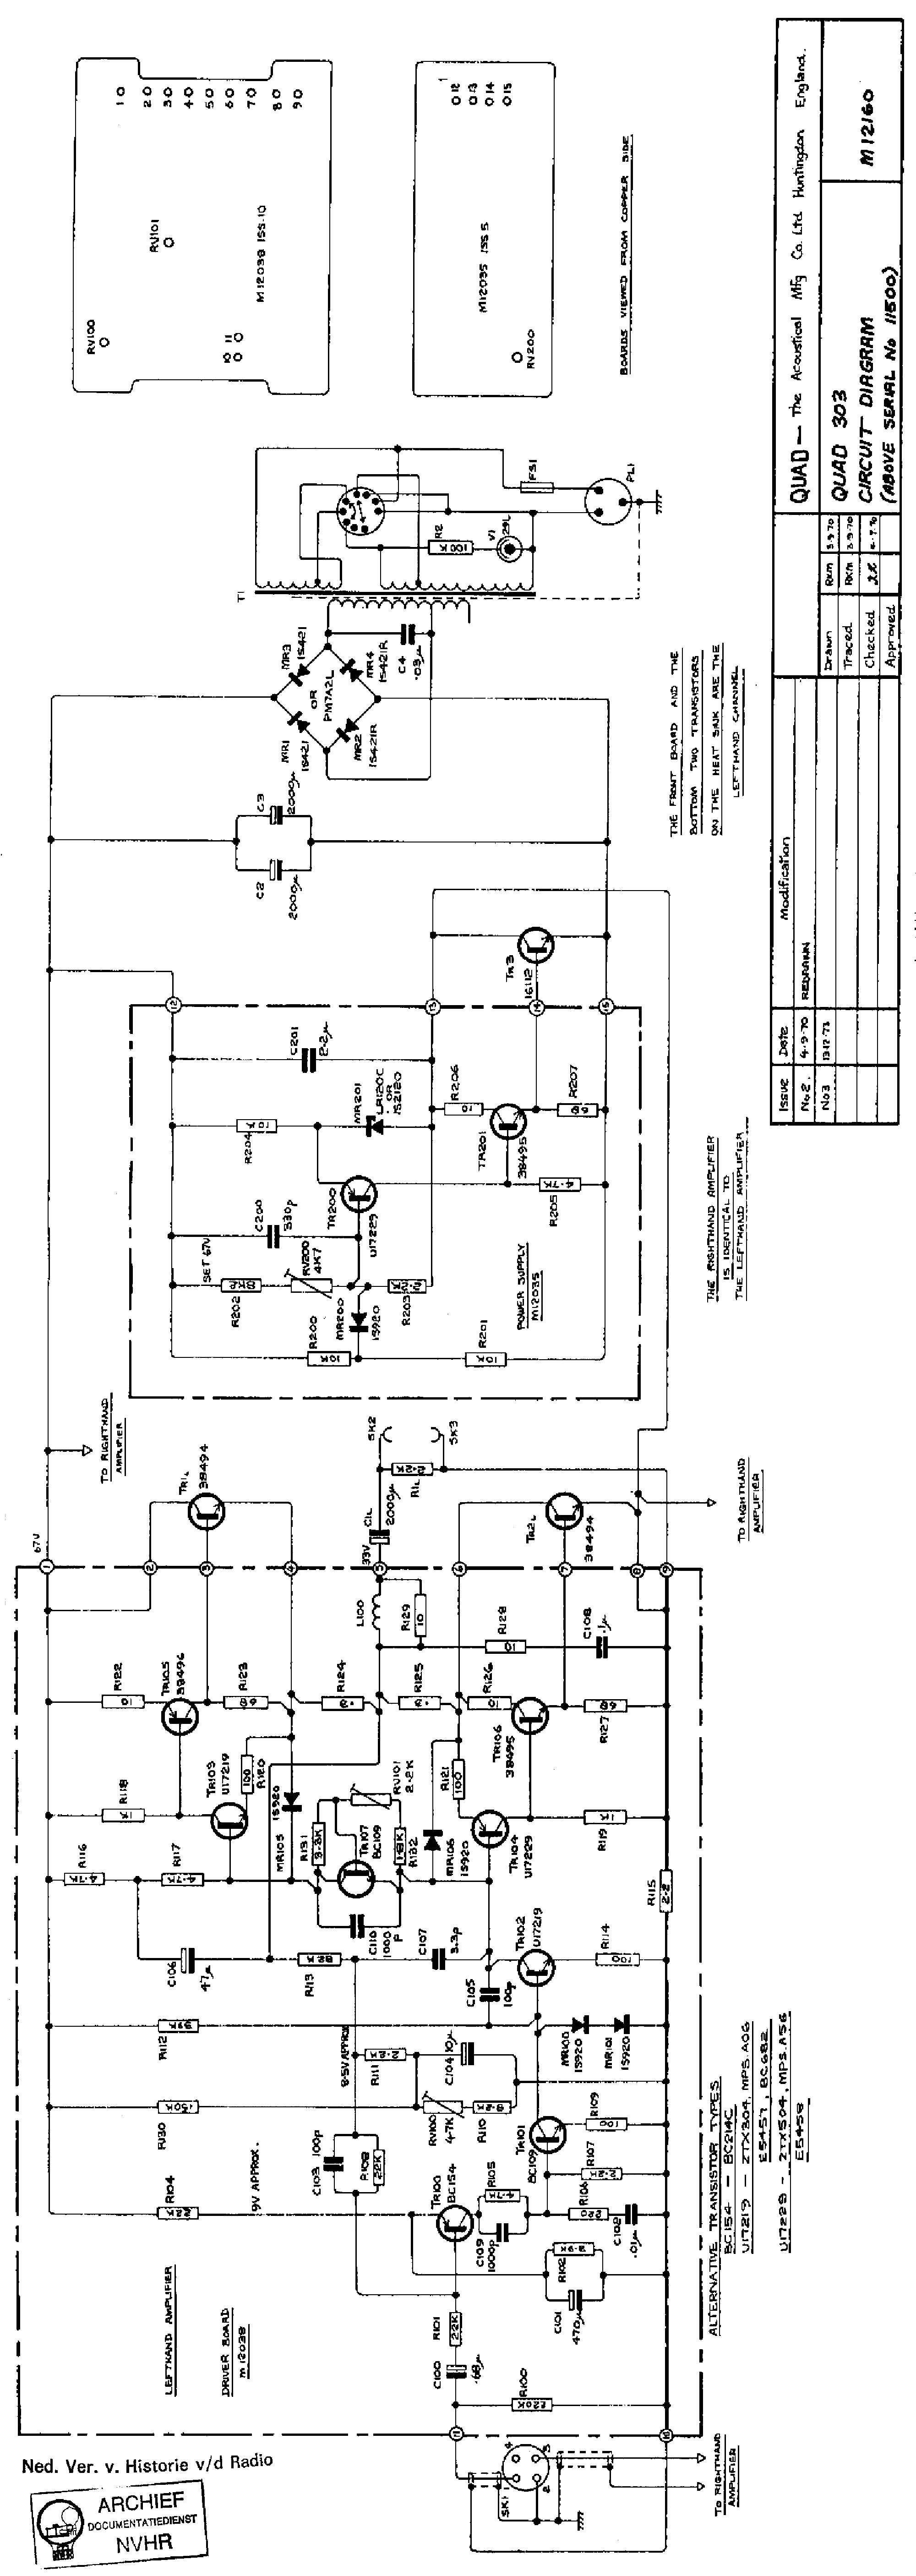 QUAD 606 SCH Service Manual free download, schematics